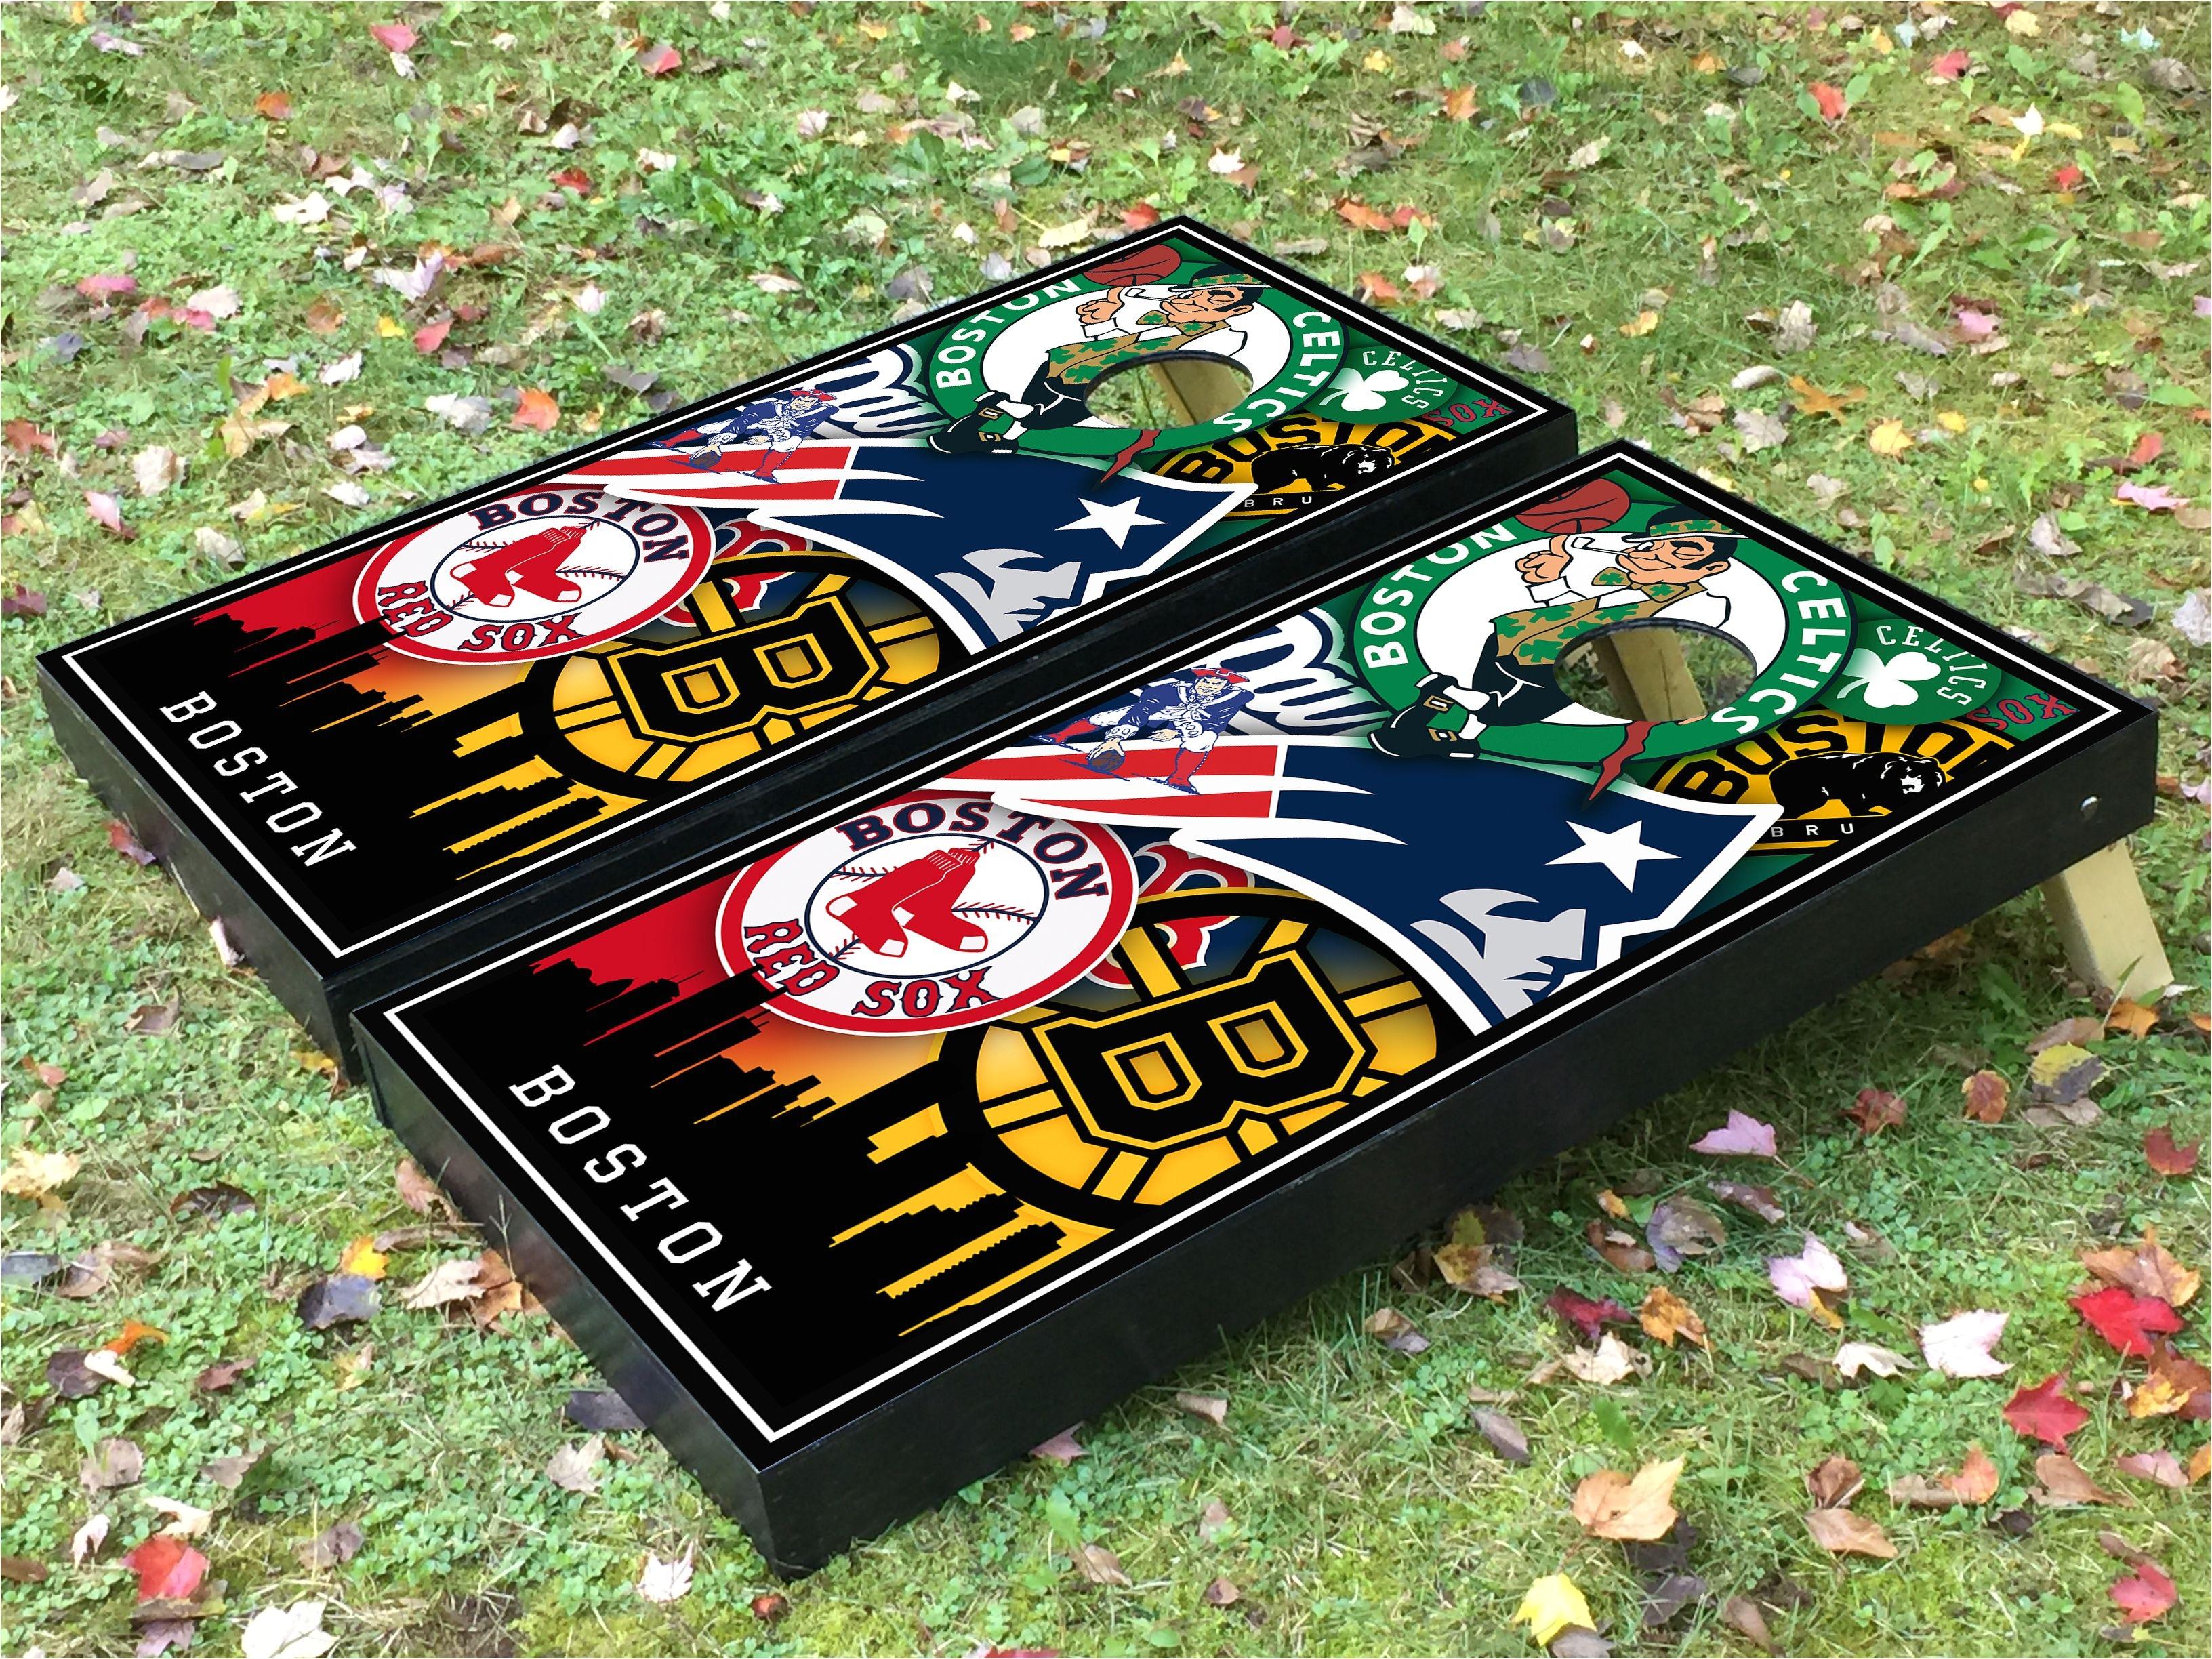 Corn Hole Lights Boston Bruins Boston Celtics Boston Red sox and New England Patriots